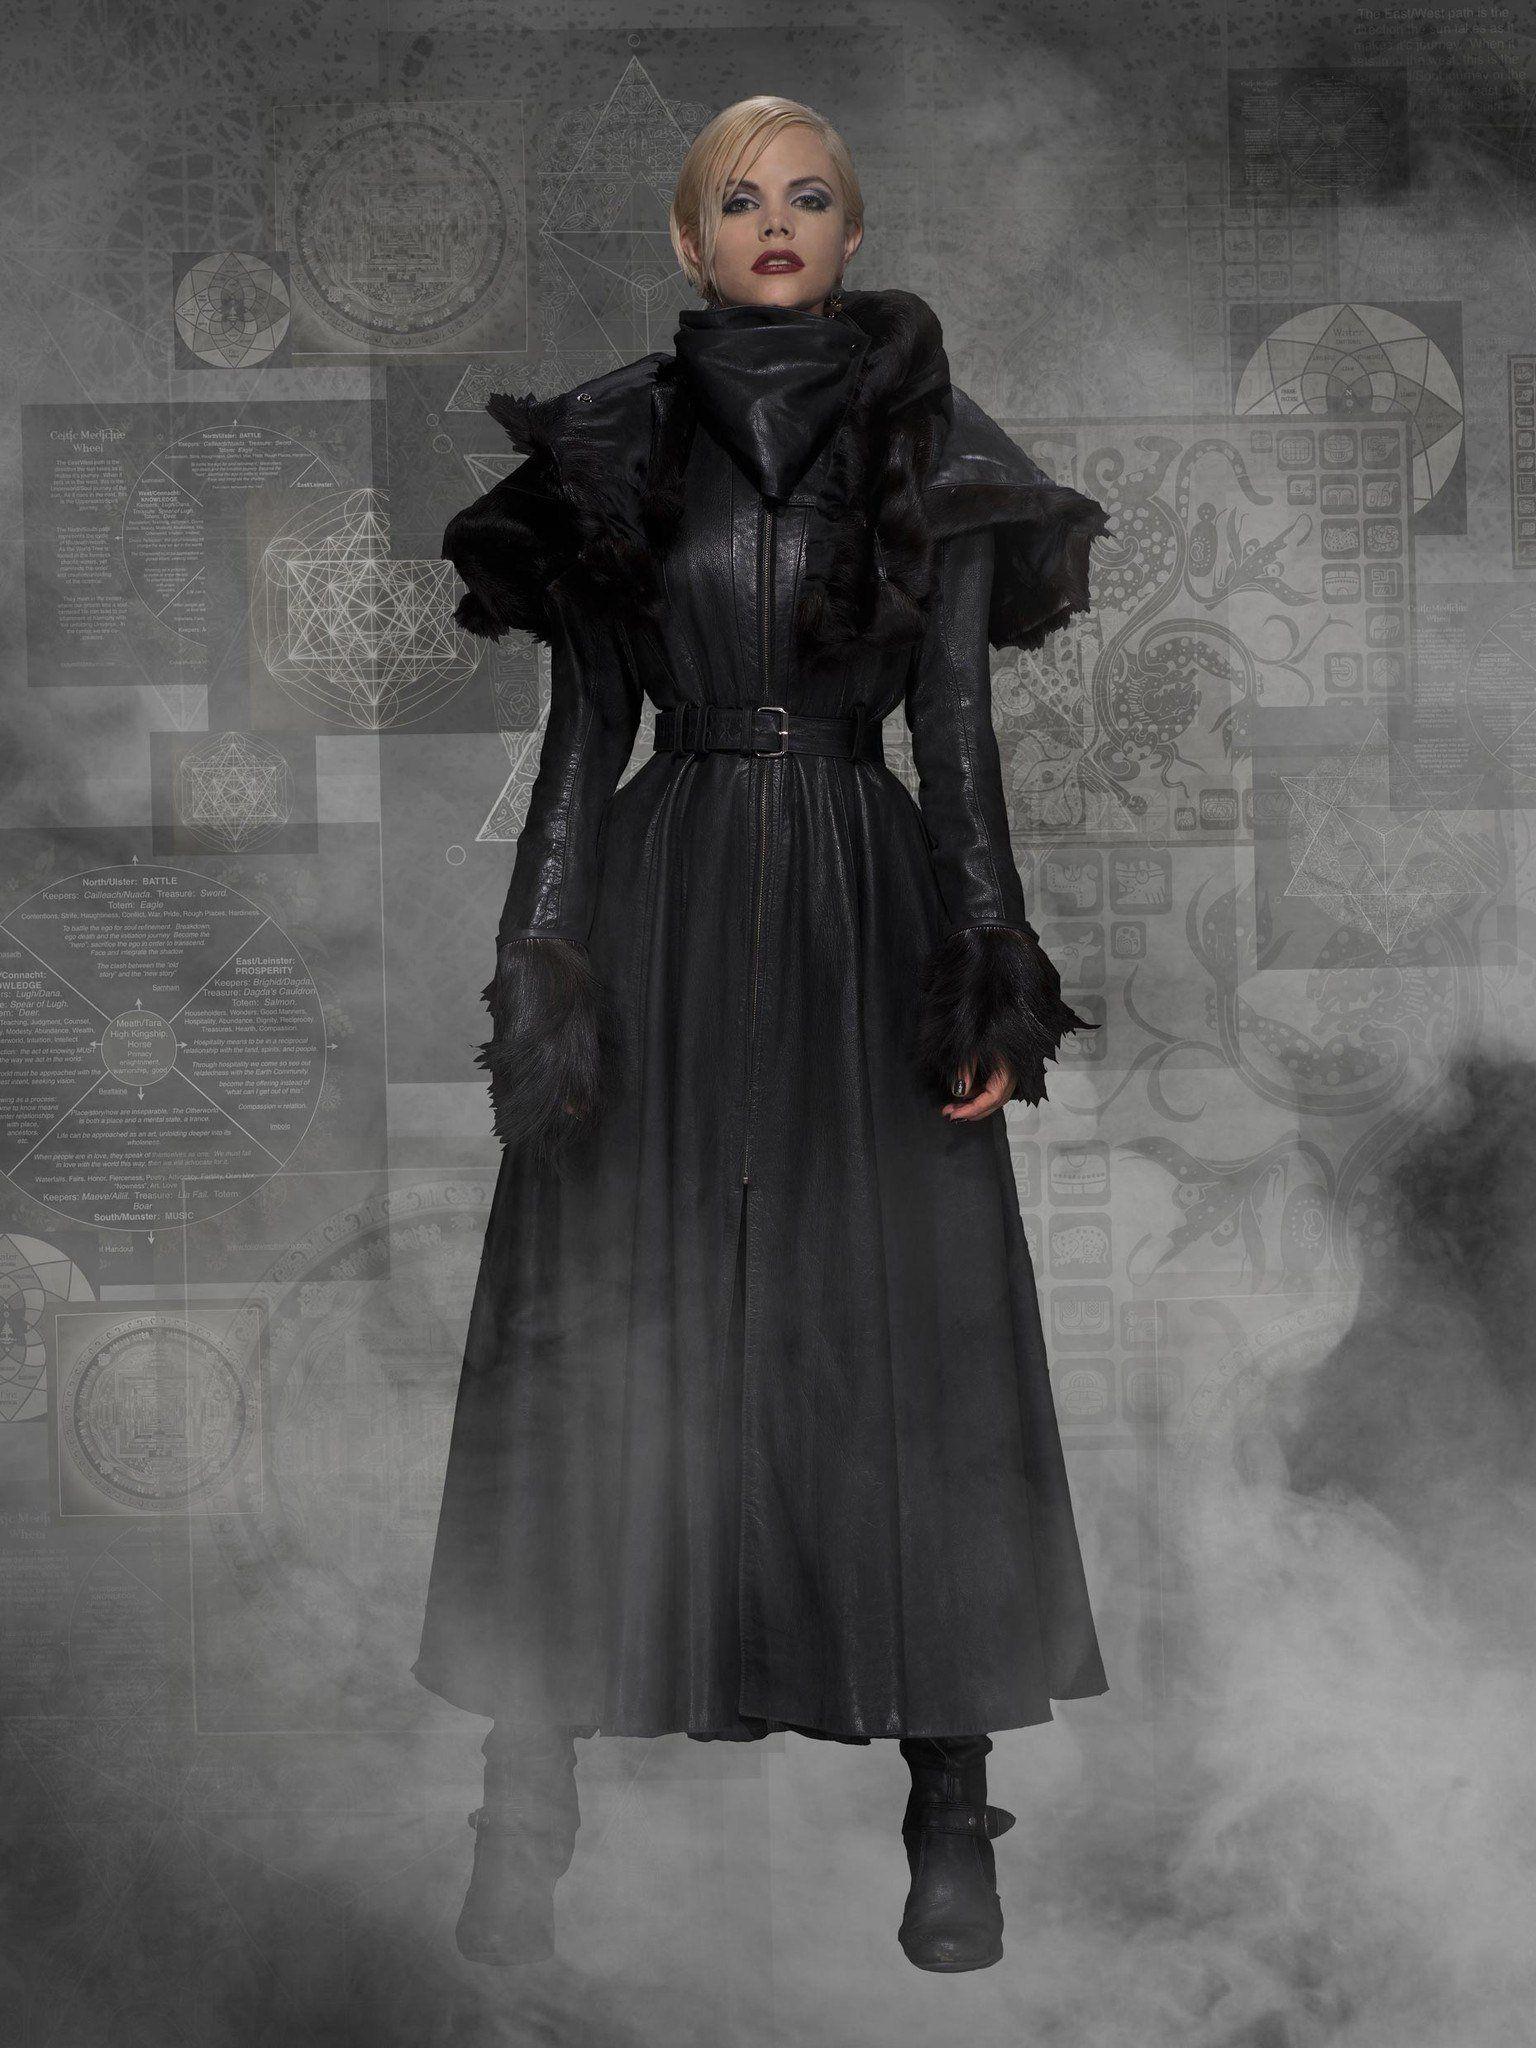 a72c2c9c1 Siren Jacket in 2019 | Haute Apocalypse | Fashion, Jackets, Gothic ...